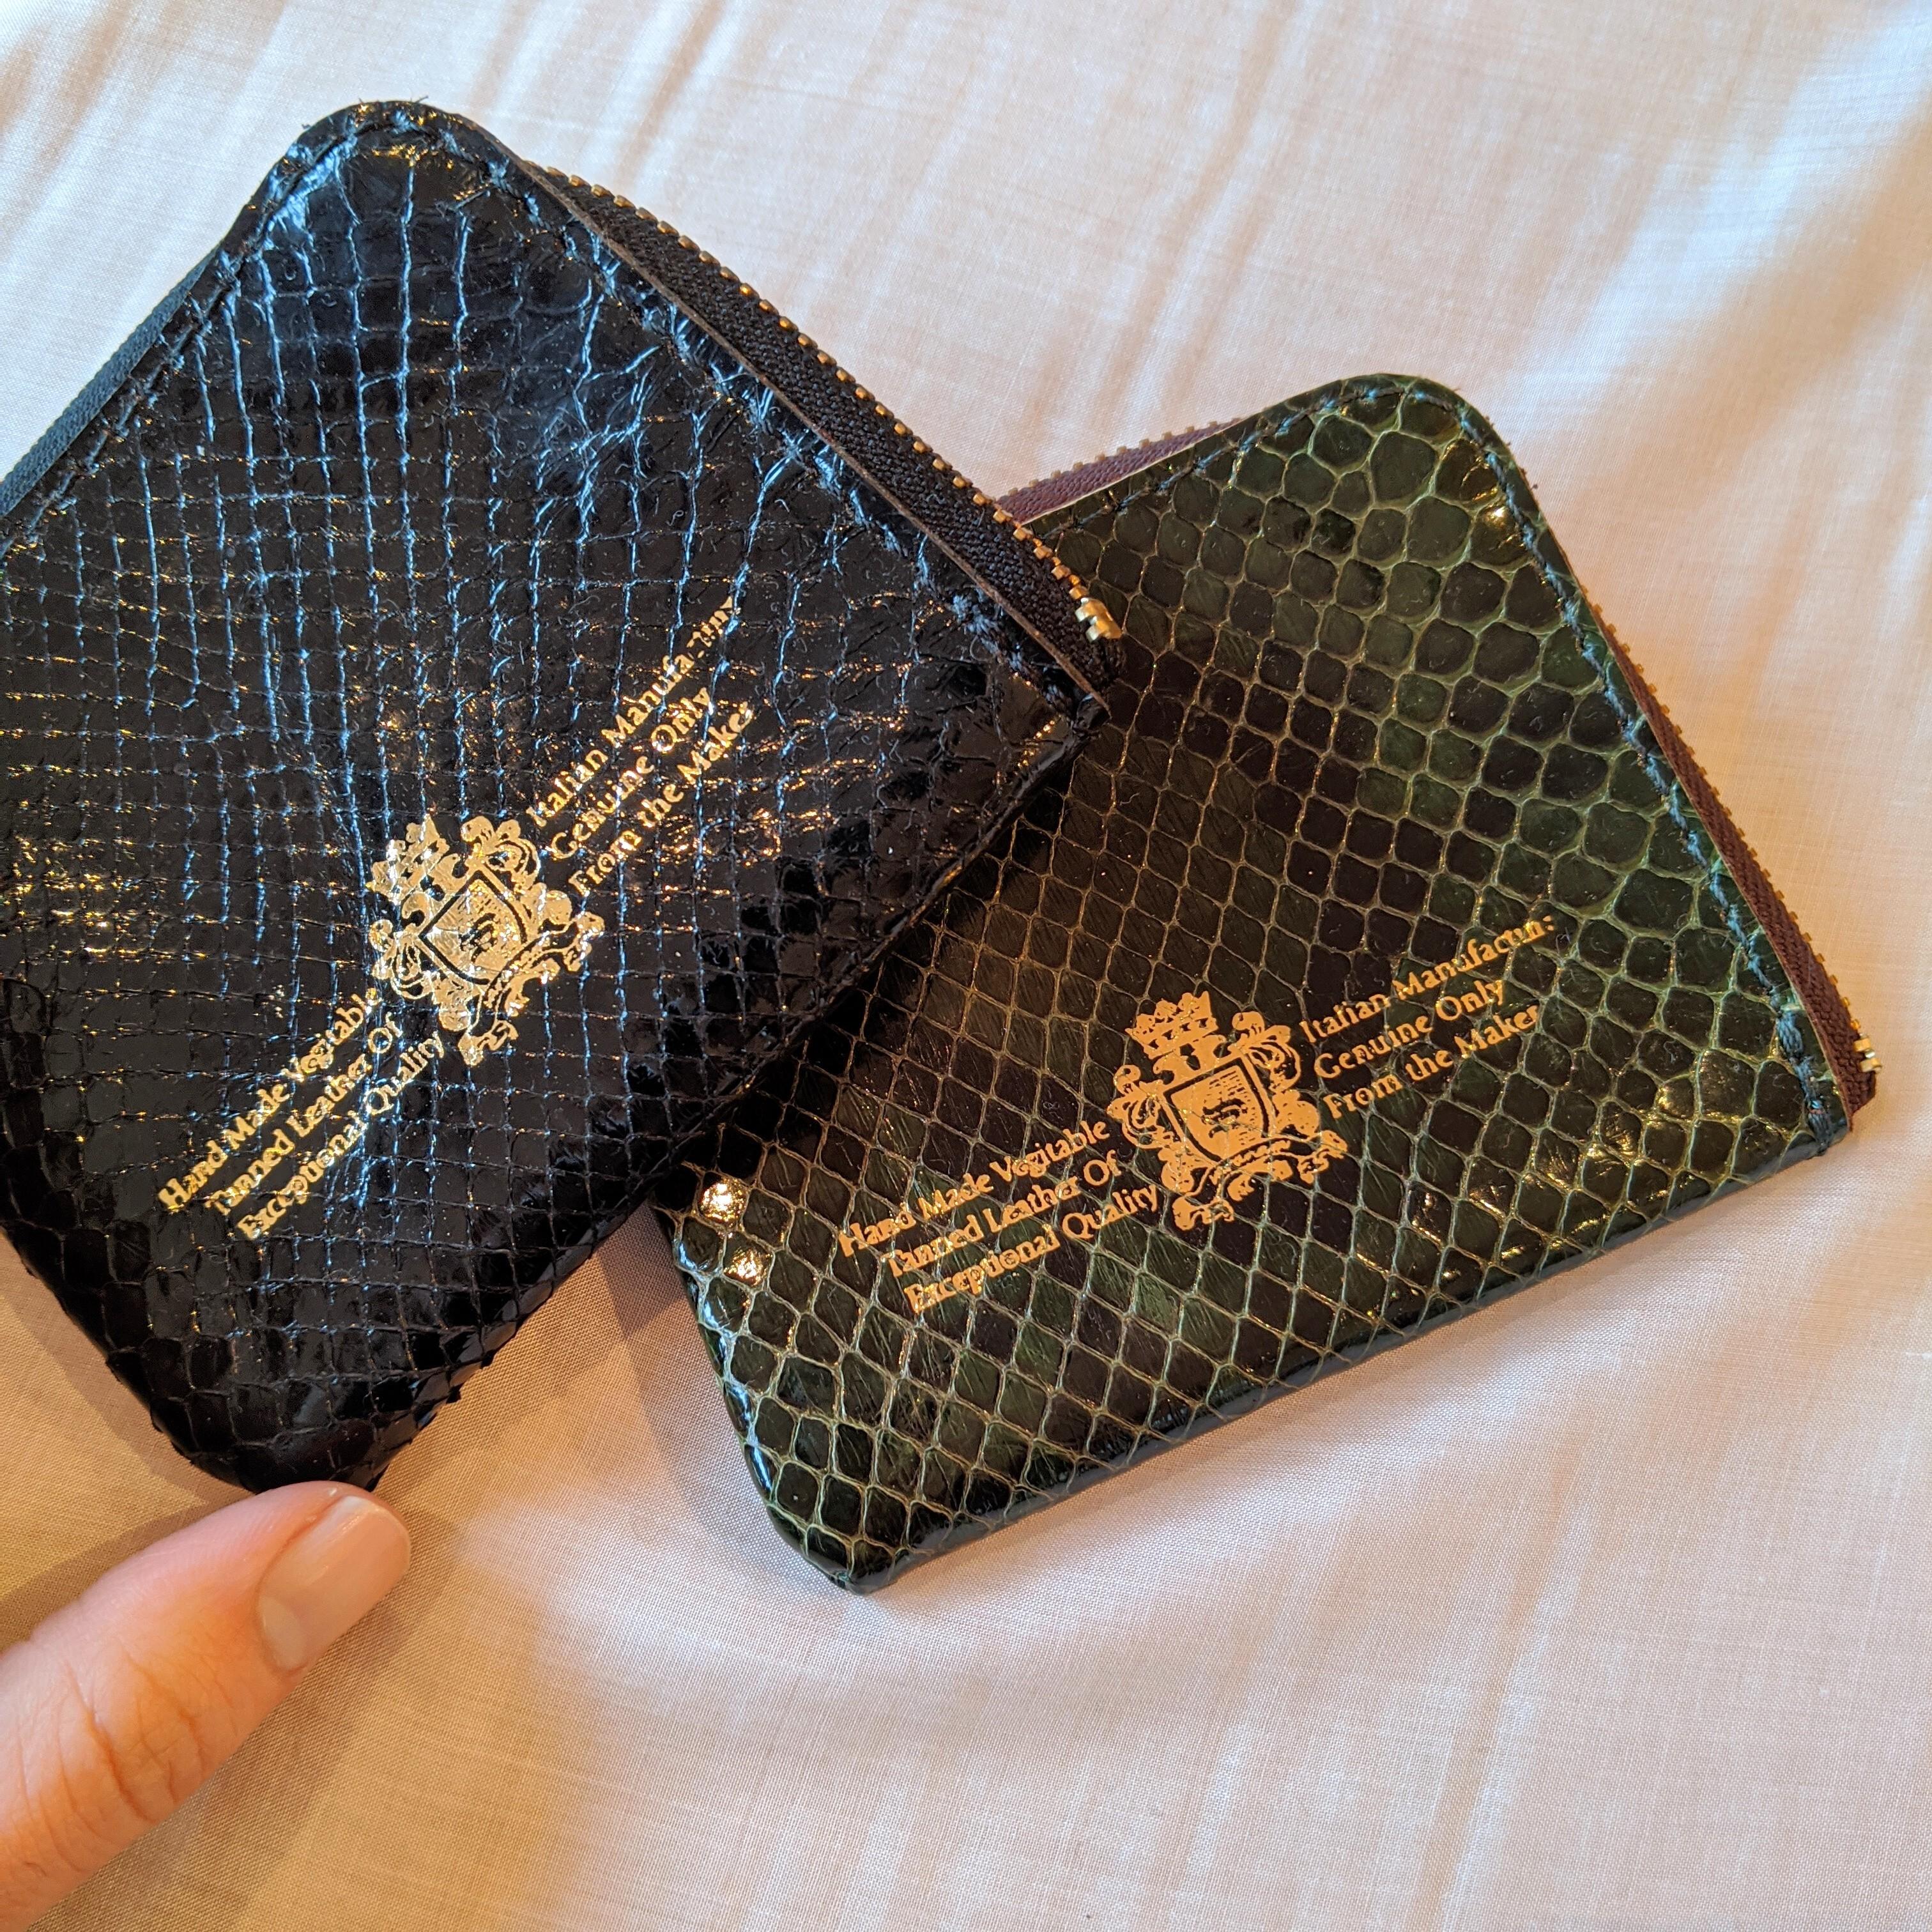 【 saranam 】サラナン pythonleather 二つ折り財布 / wallet ヘビ革